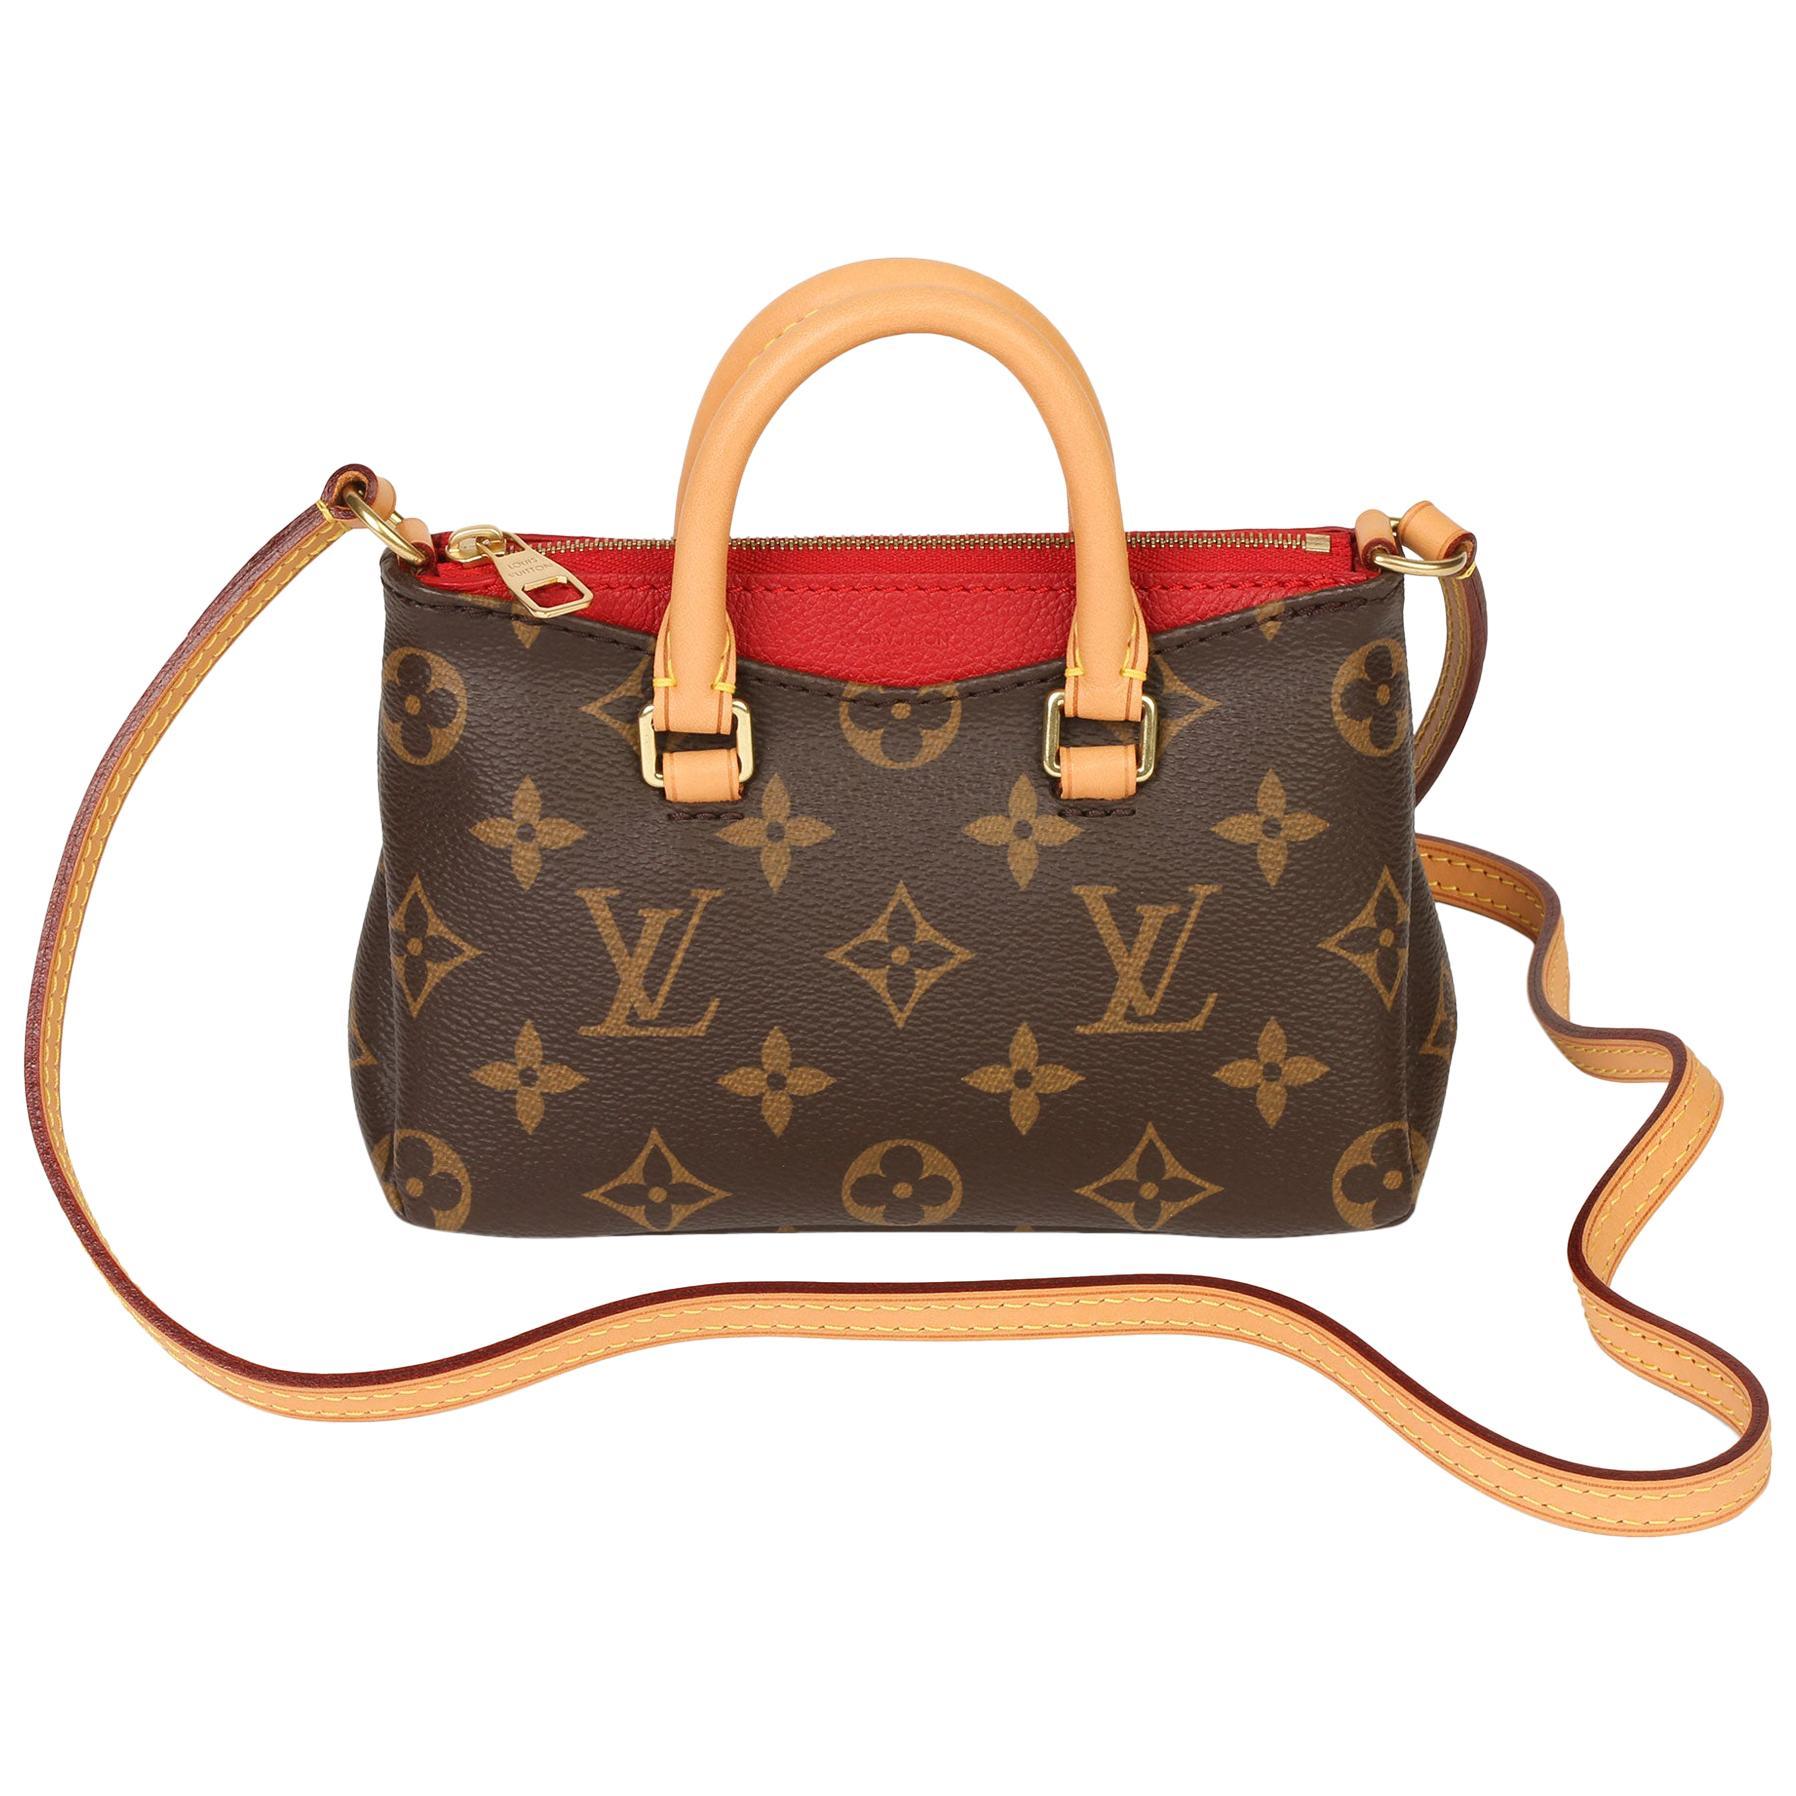 Louis Vuitton Cherry Brown Monogram Coated Canvas & Vachetta Leather Nano Pallas